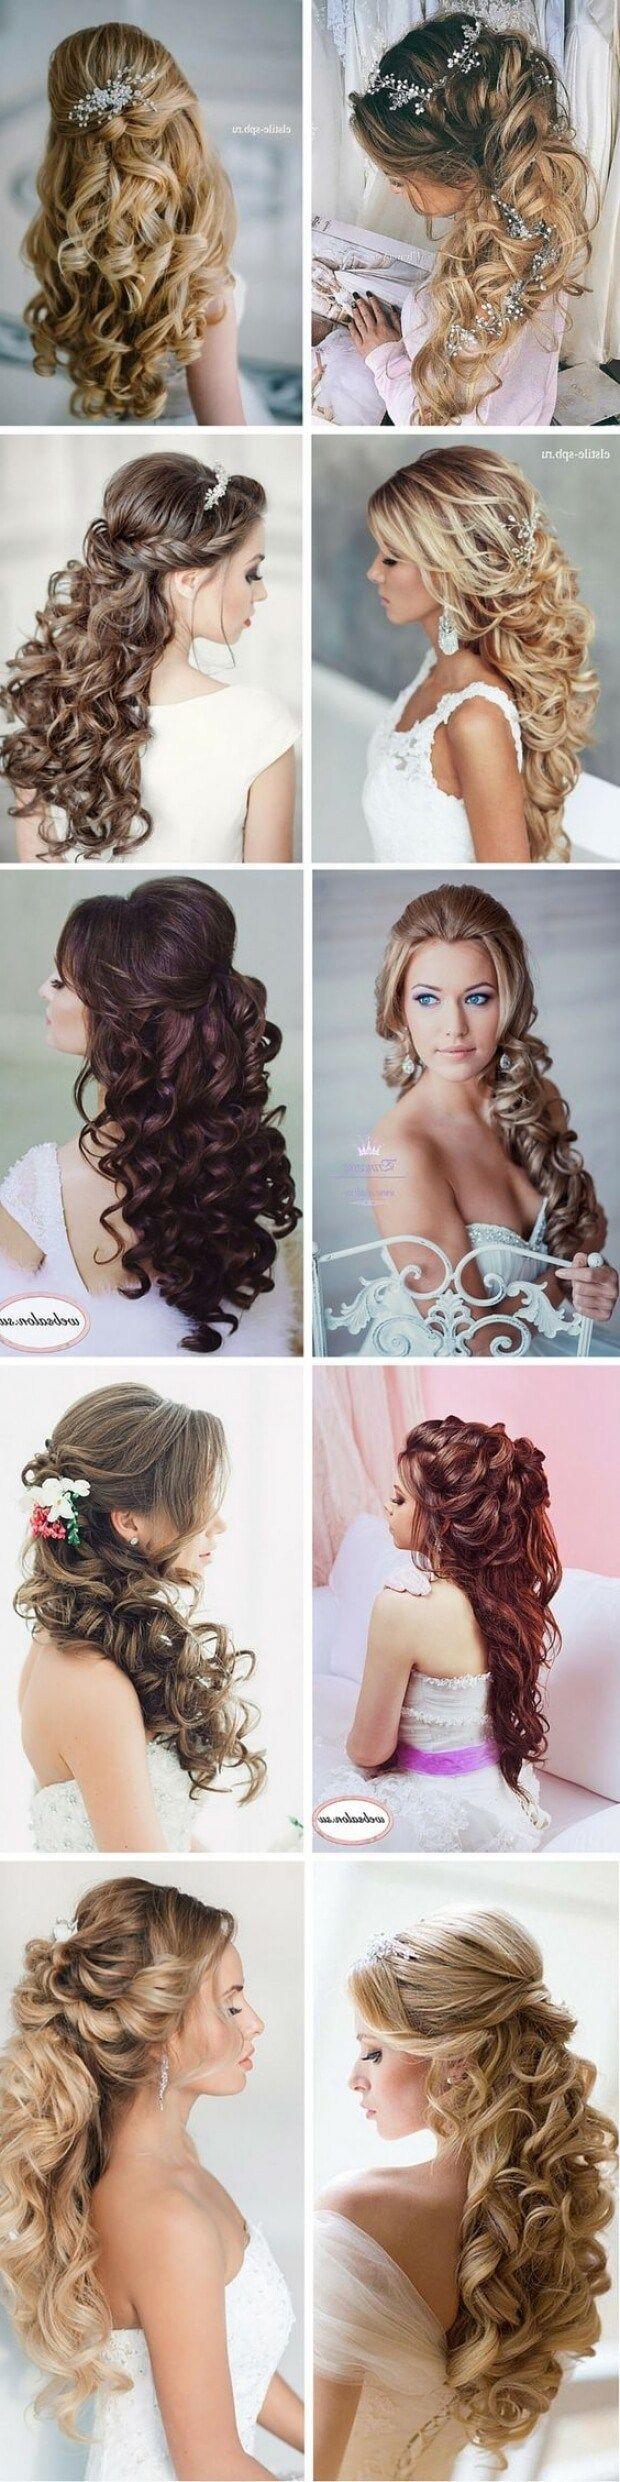 100 romantic long wedding hairstyles 2018 curls half up updos within long half up wedding hairstyles